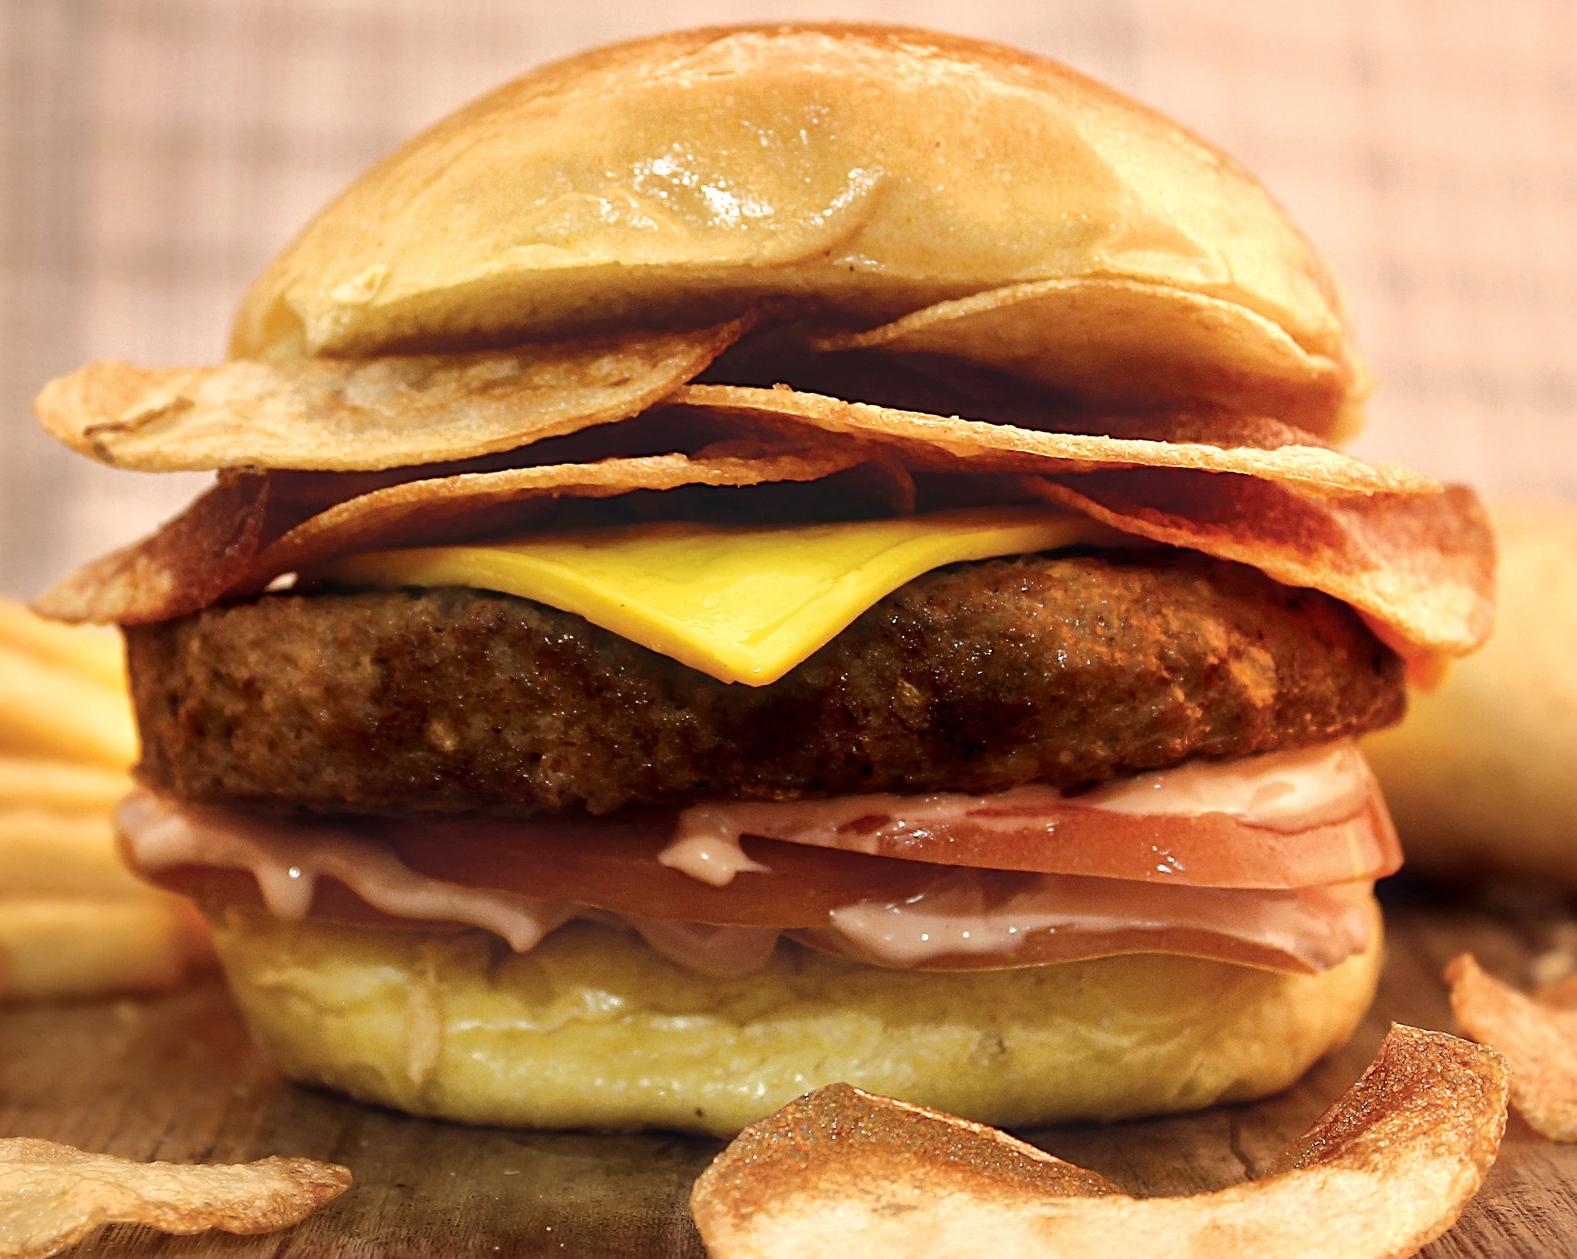 D'BARN BURGER                            39   Prime ANGUS beef patty, swiss cheese, tomato, pickle, potato fridge, stike sauce